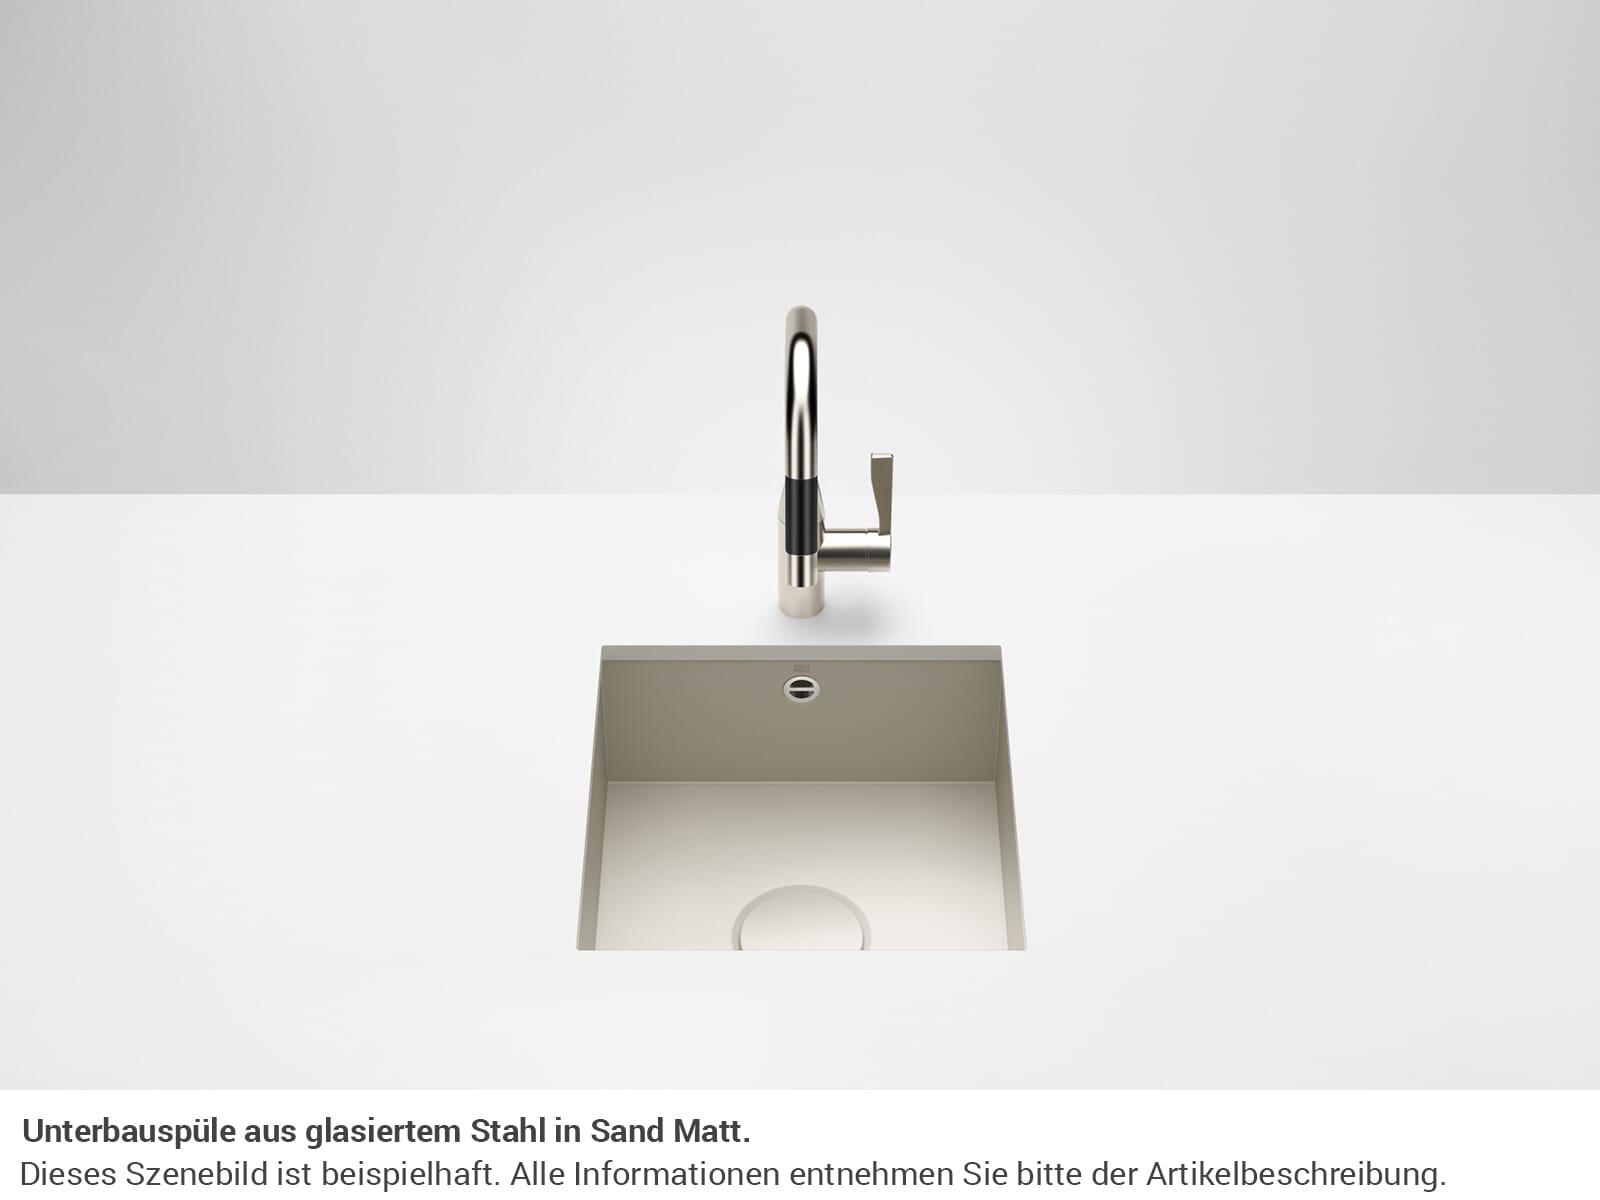 Dornbracht Unterbau-Spüle Glasierter Stahl Sand Matt 38400002-72